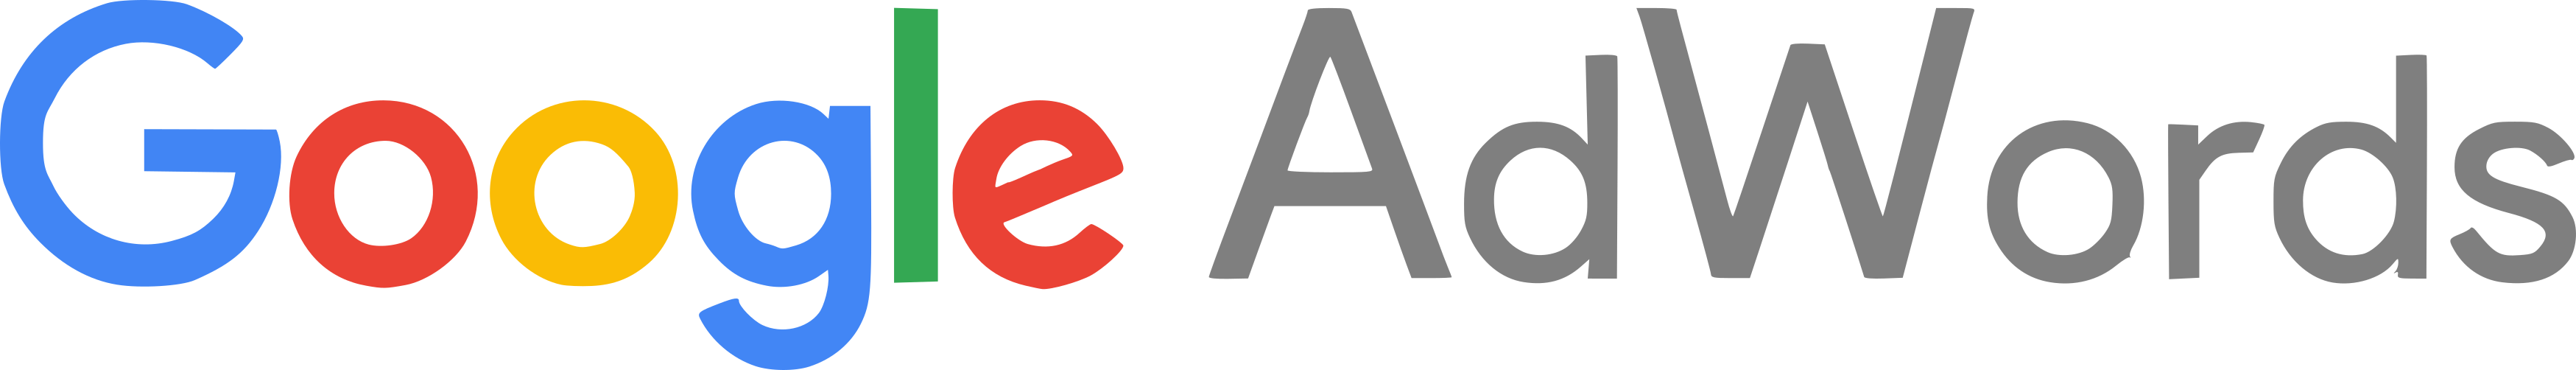 google adwords logo - Google AdWords Logo